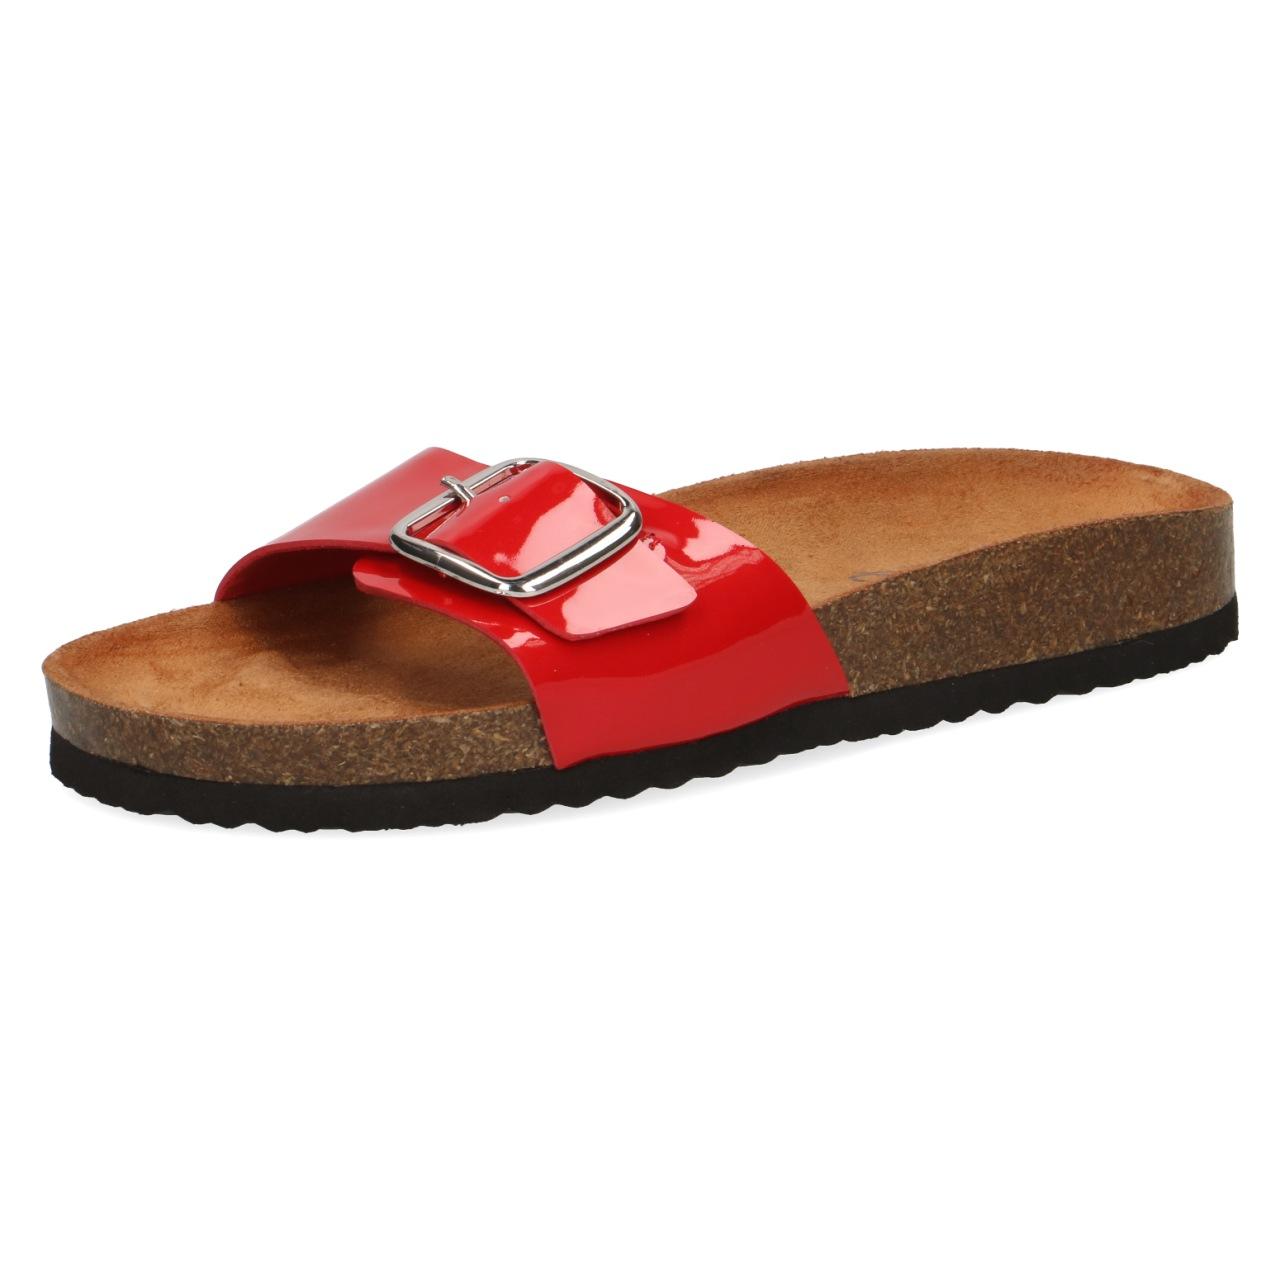 Details zu CAPRICE 9 27403 22 Damen Sandale Sandalette Pantolette Fußbett Rot SALE